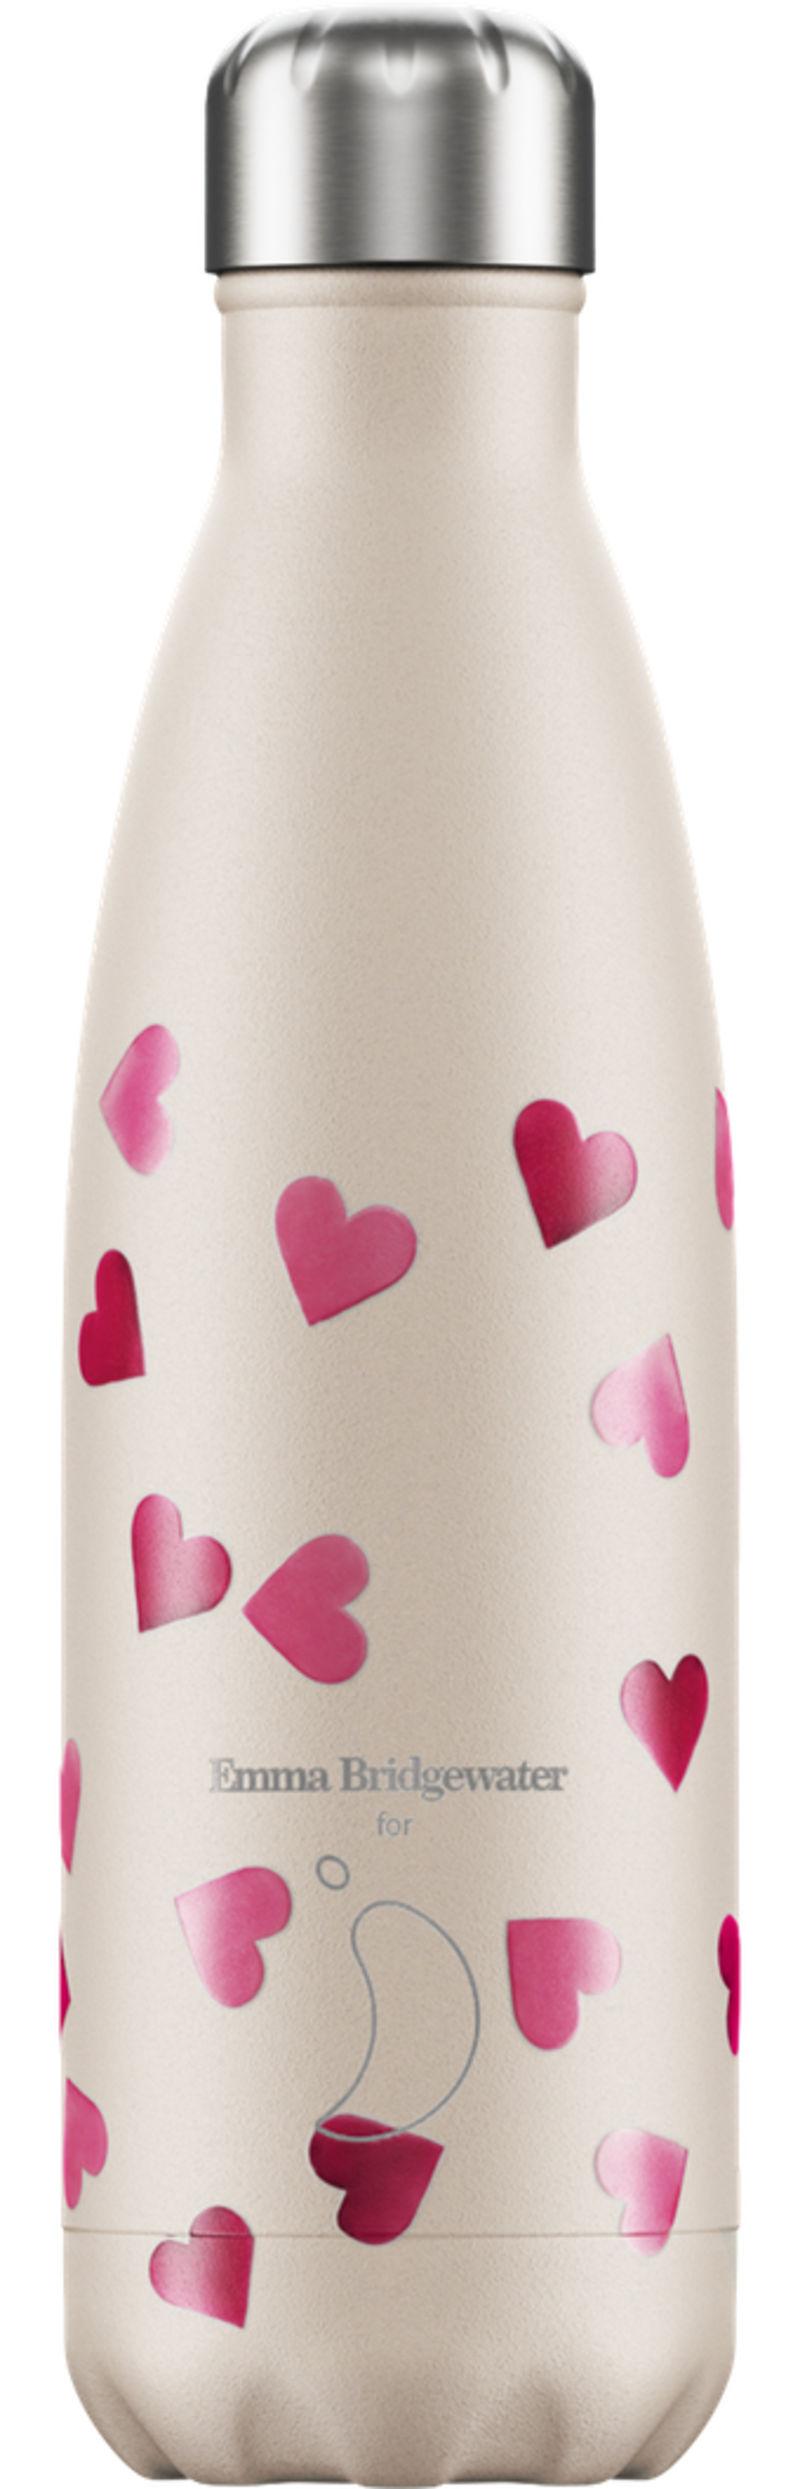 Botella Inox Corazones 260ml -